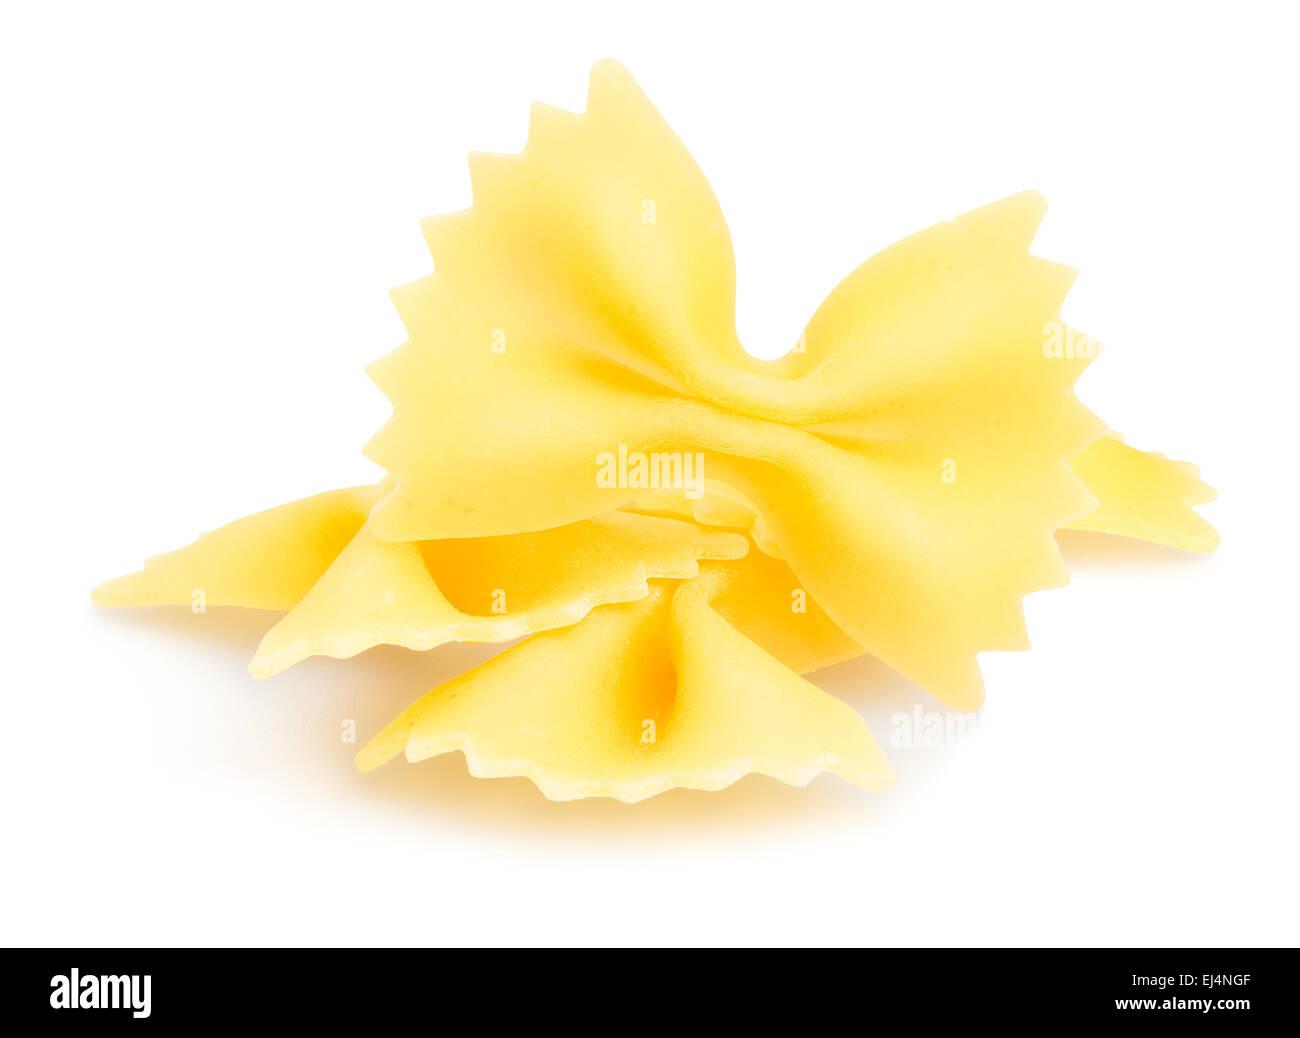 pasta isolated - Stock Image